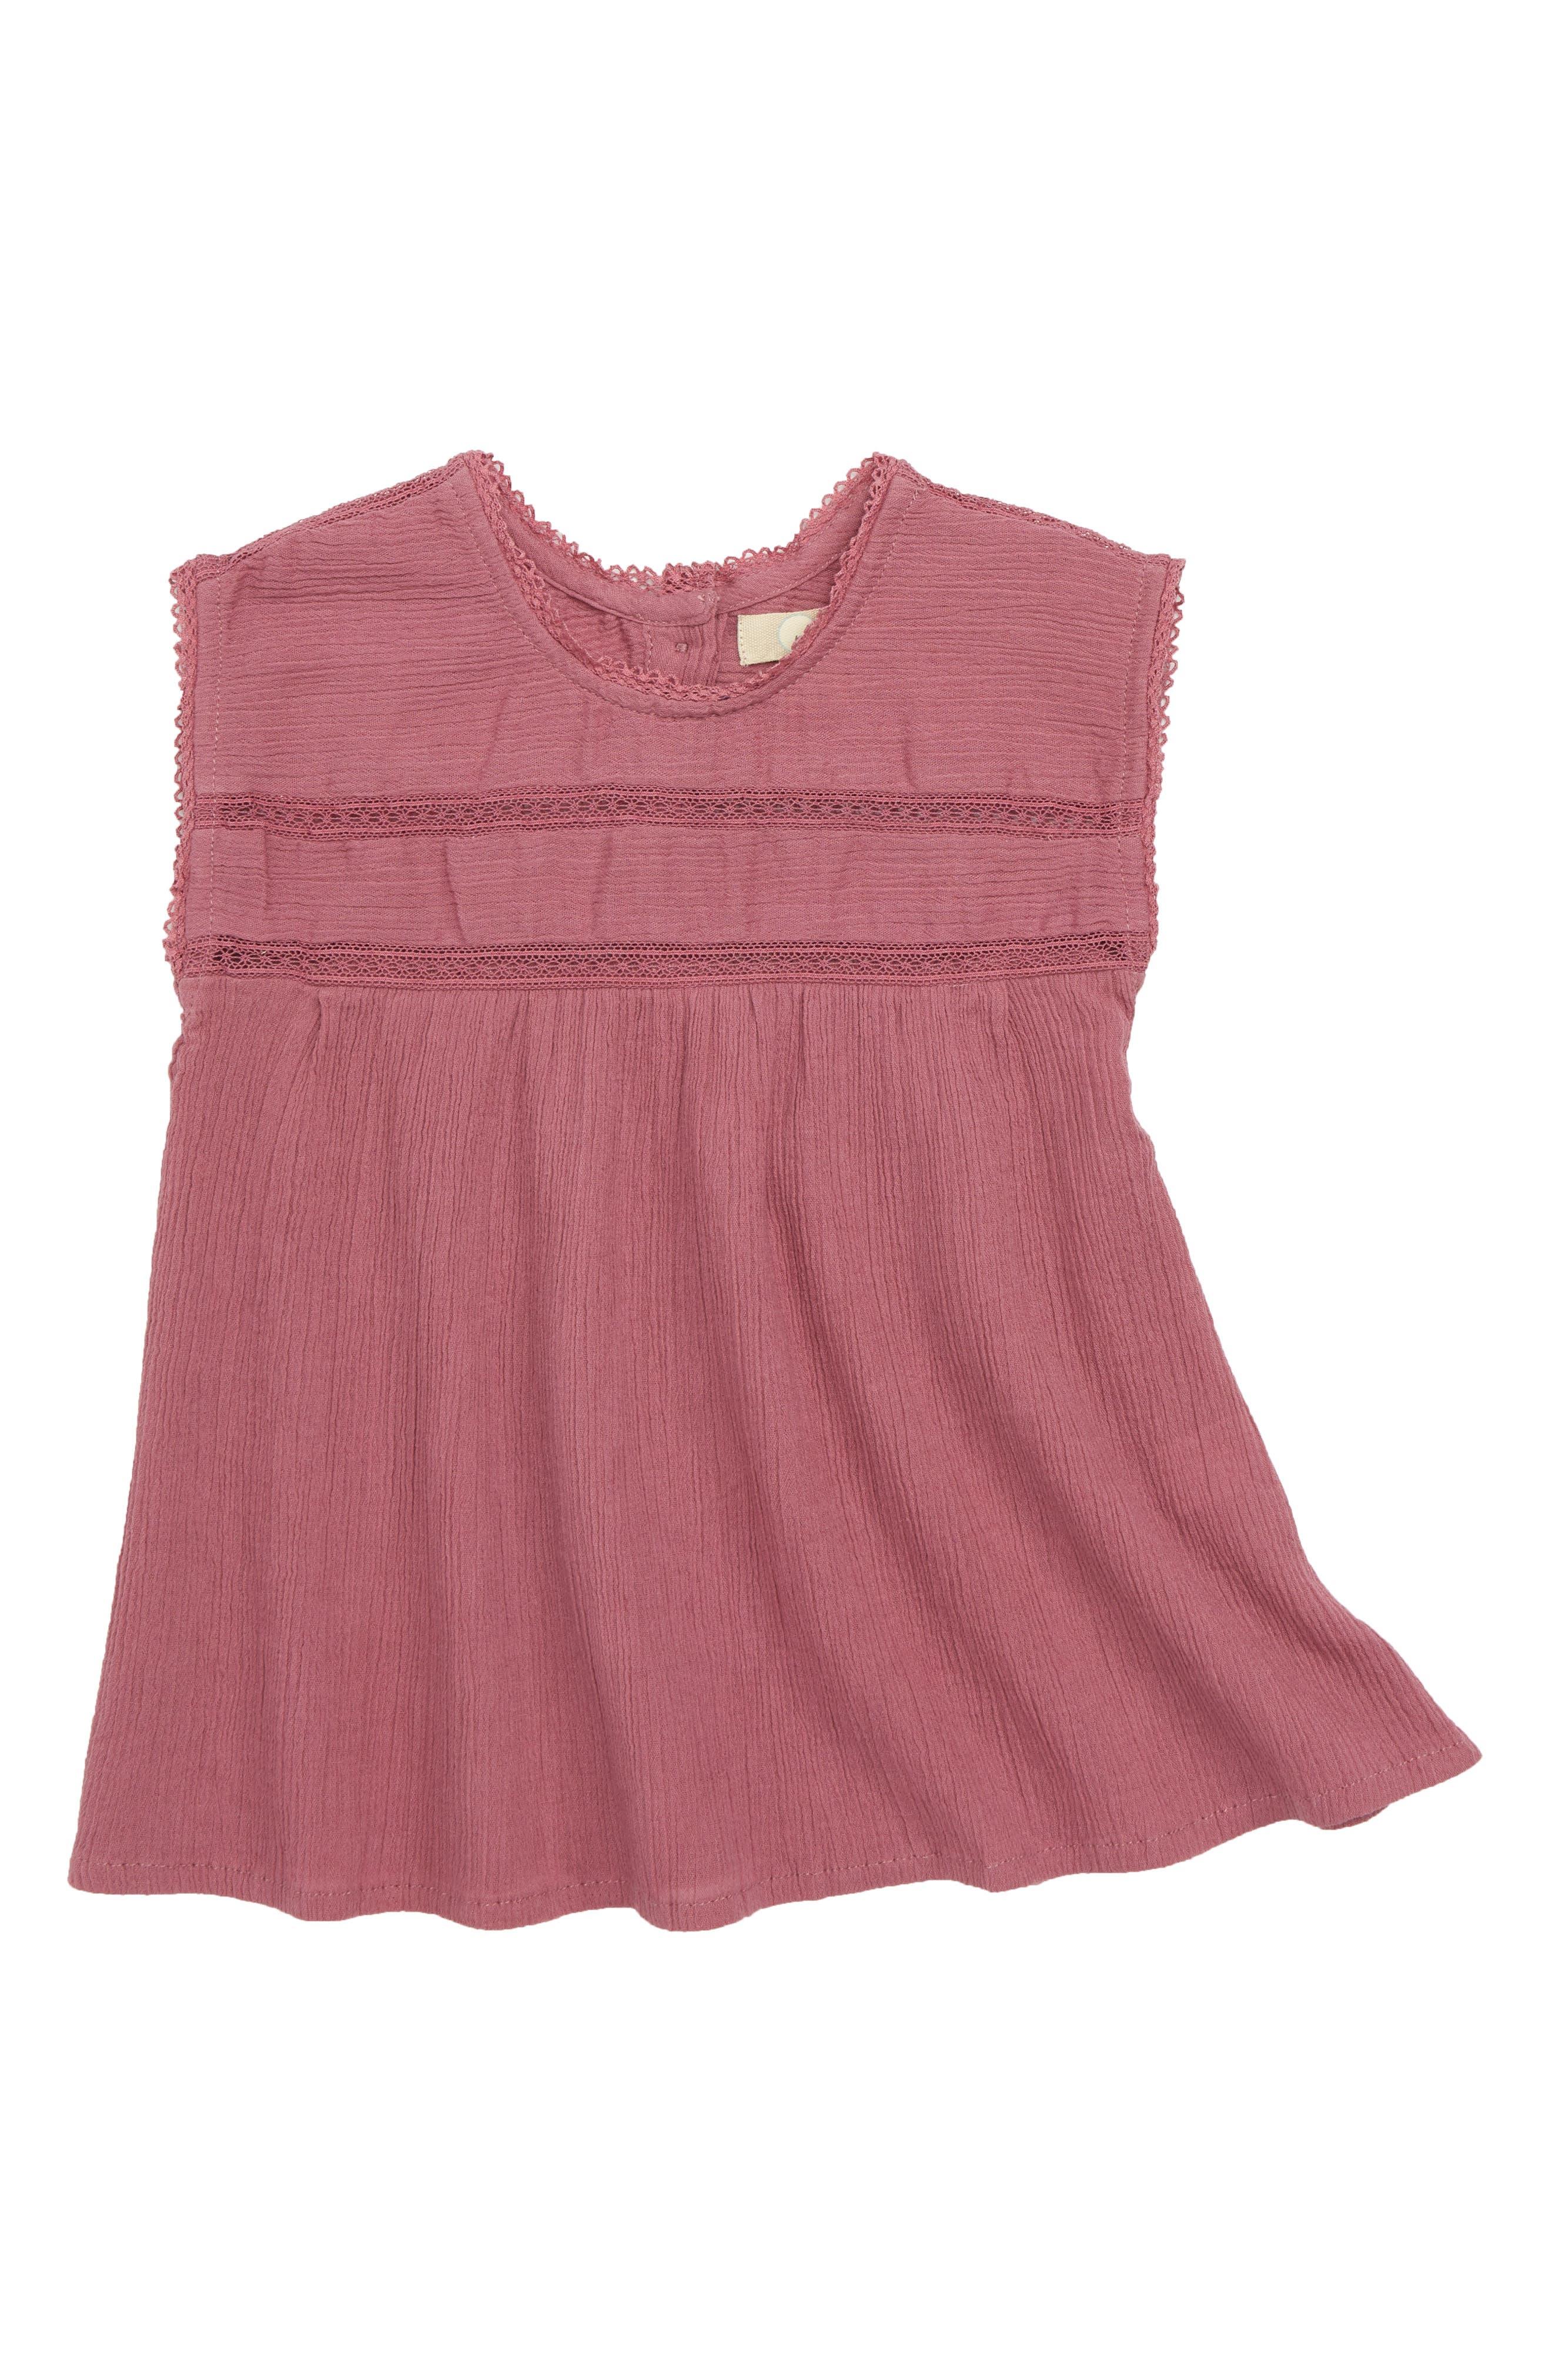 Kensie Crinkle Dress,                         Main,                         color, Mauve